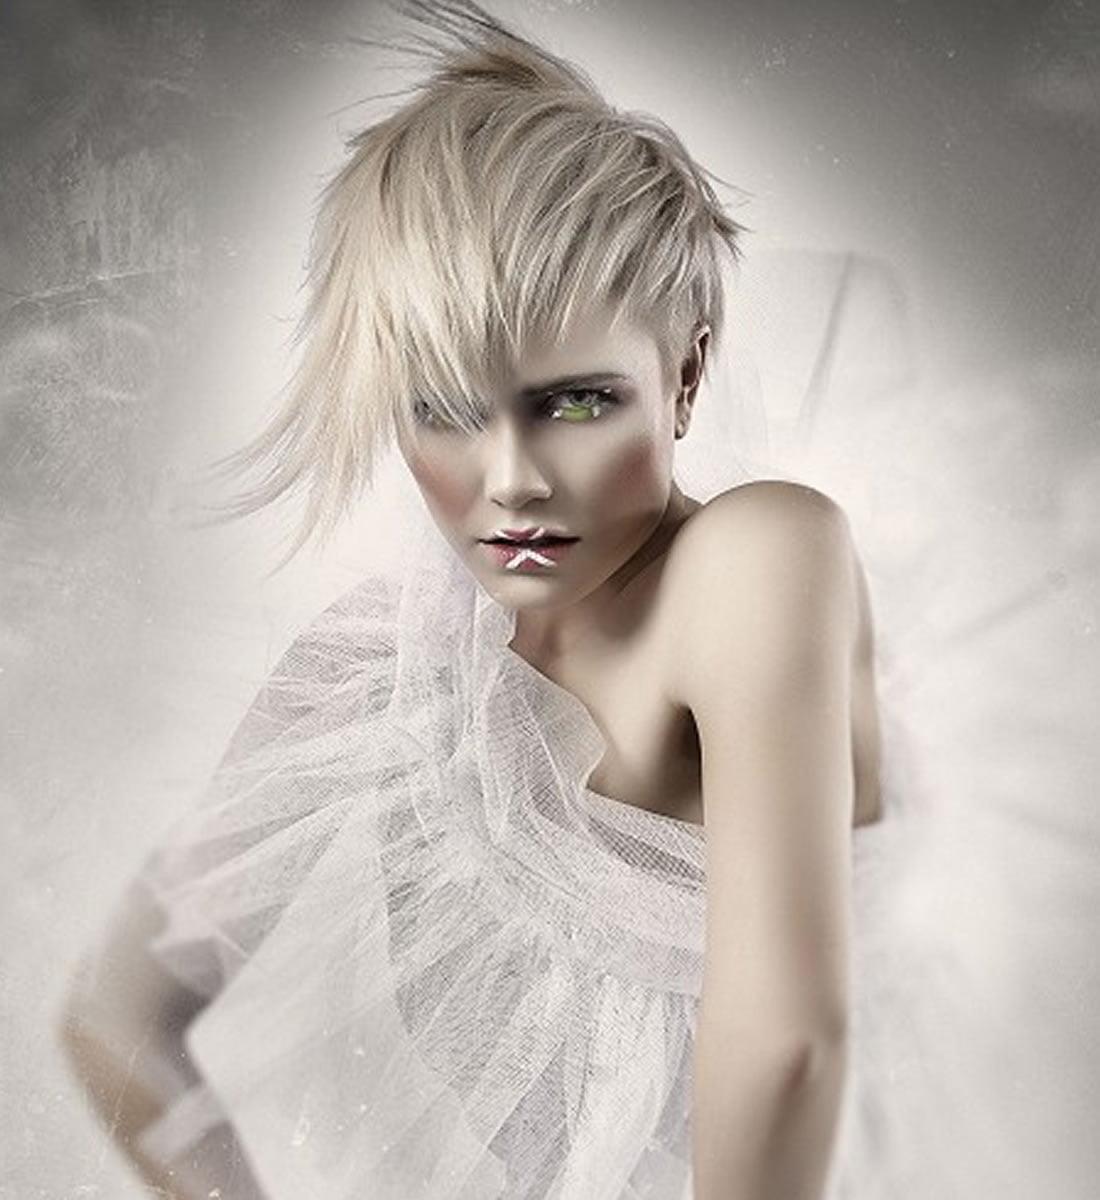 20 Trendy Hair Color Ideas 2019 Platinum Blonde Hair Ideas: Platinum Blonde Hair Color Ideas For 2018-2019